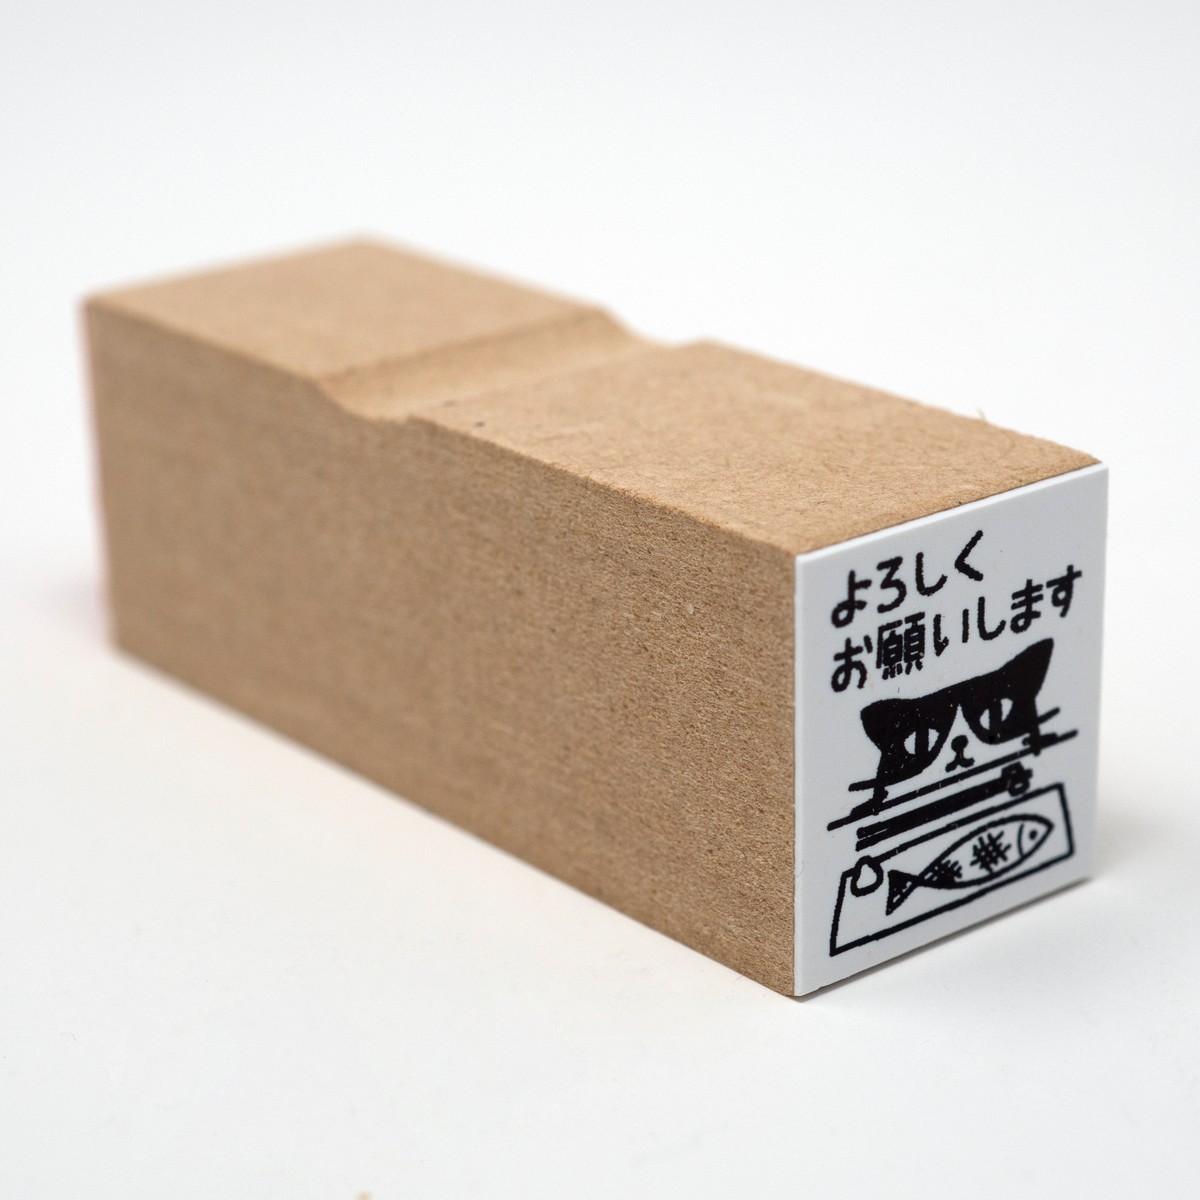 Photo of Greetings Friend Ink Stamp